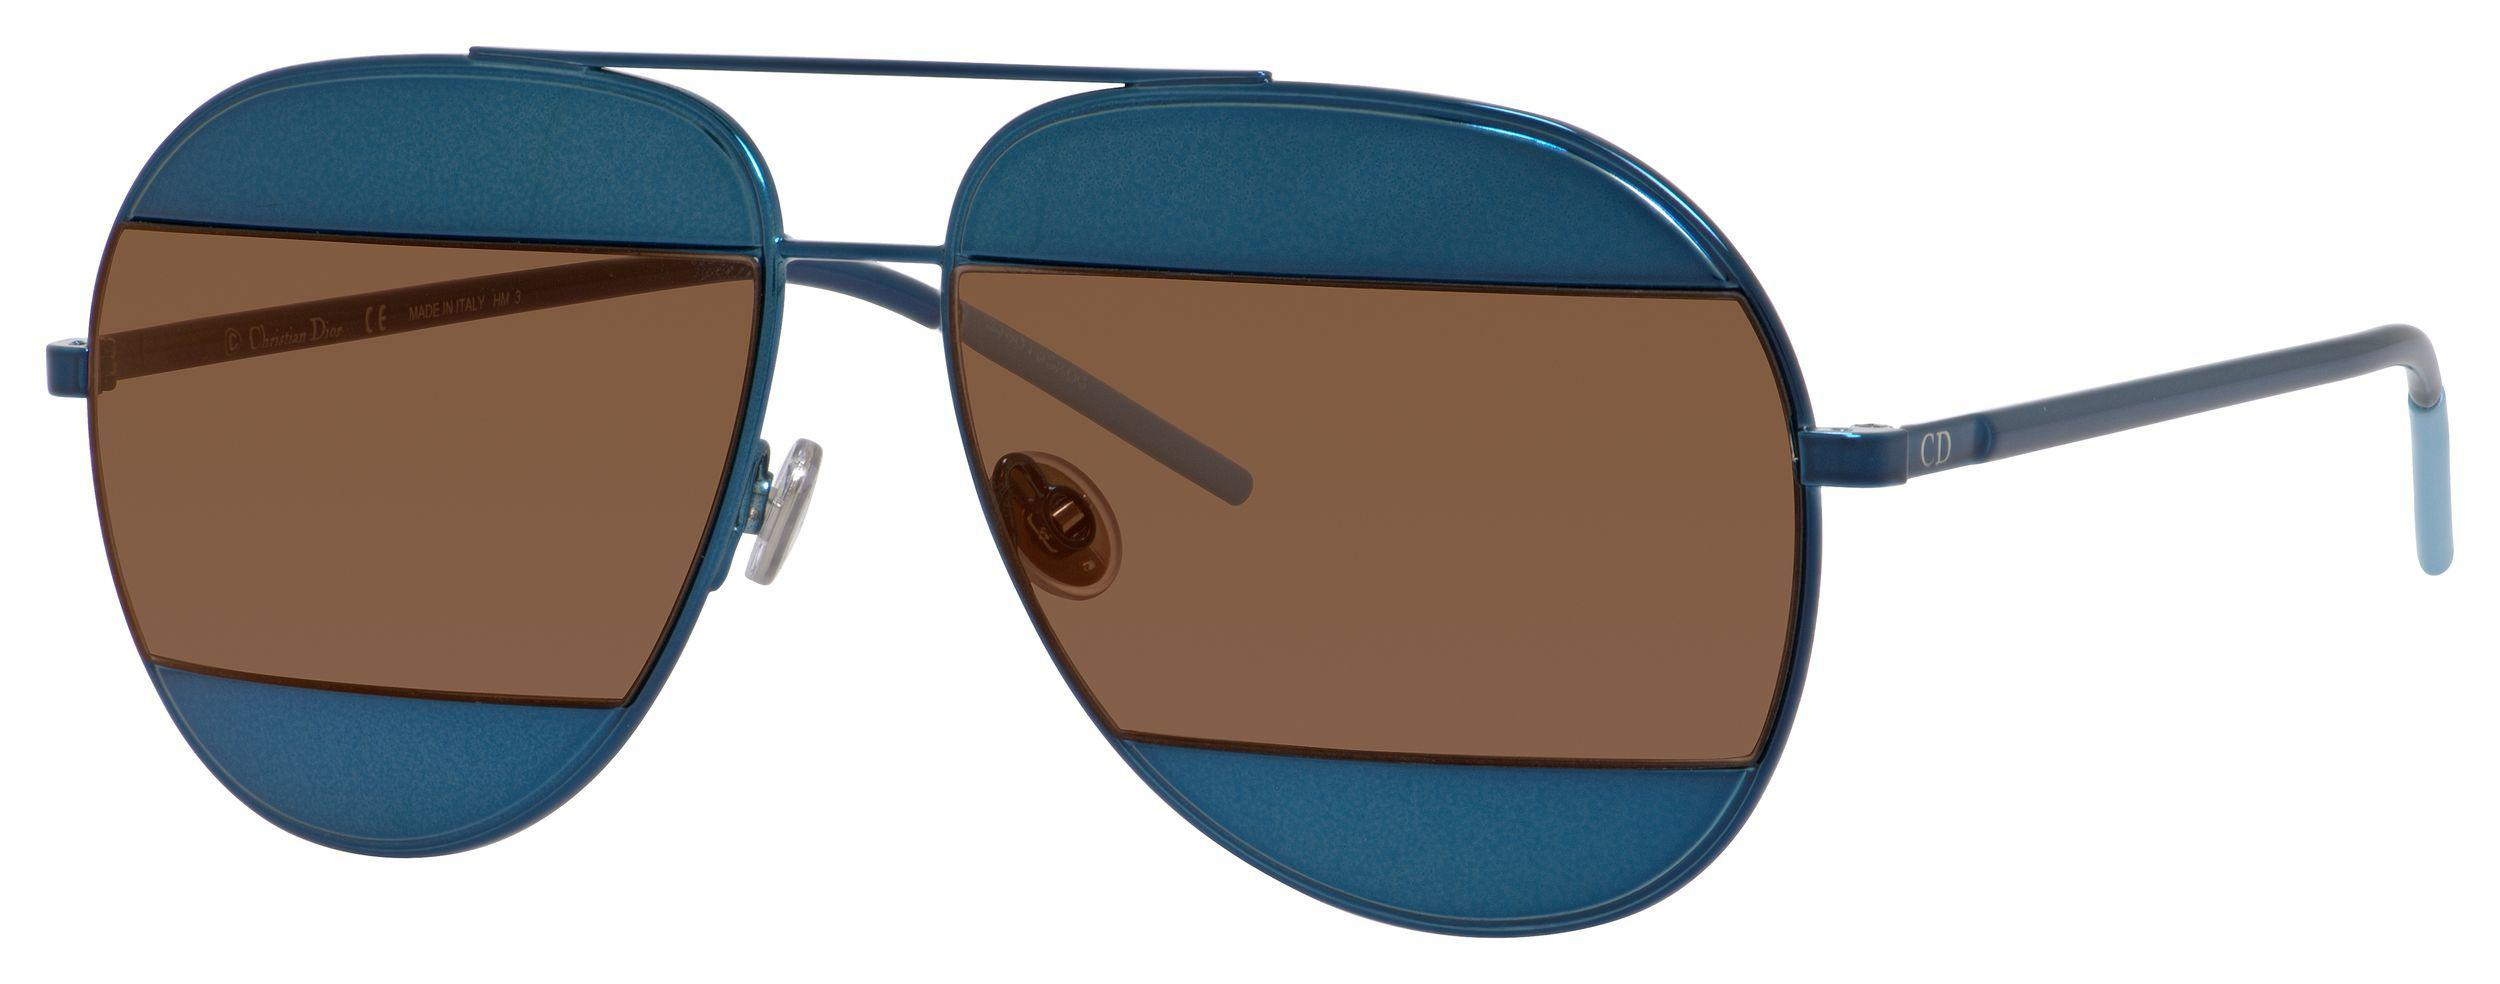 9490aec6042cd Dior Aviator Sunglasses Price